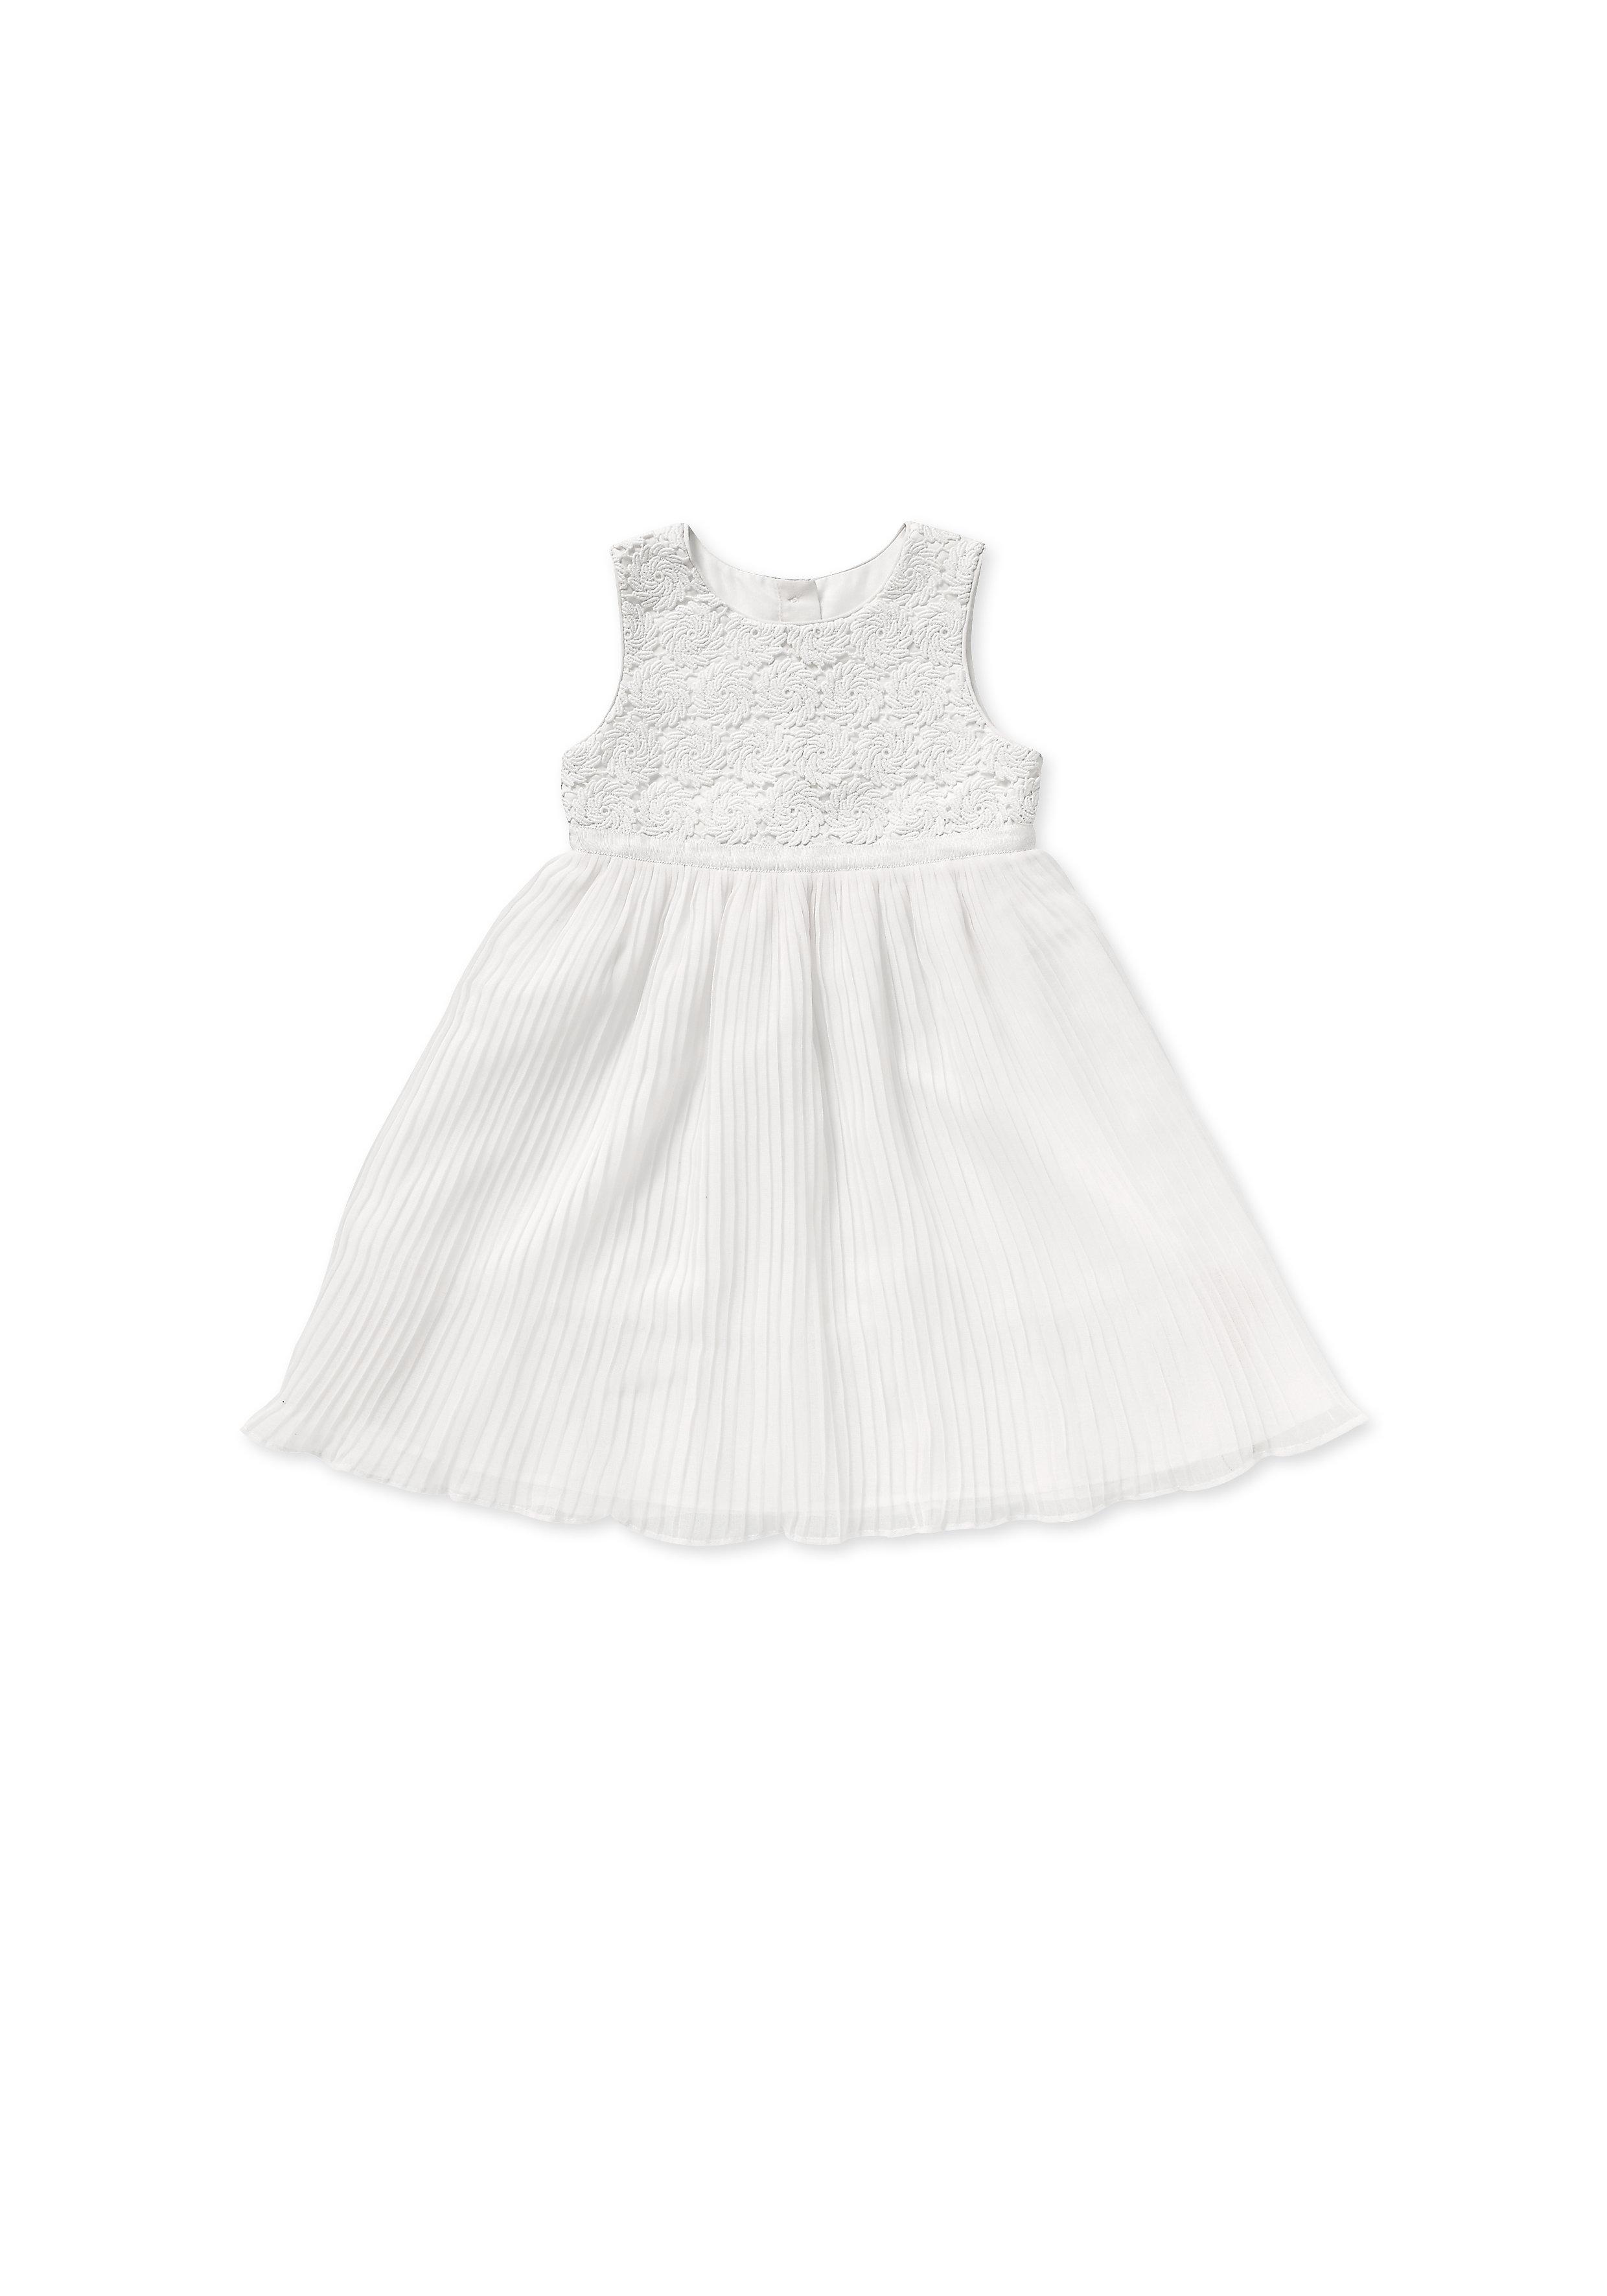 Mothercare | Girls Sleeveless Dress Embroidered - White